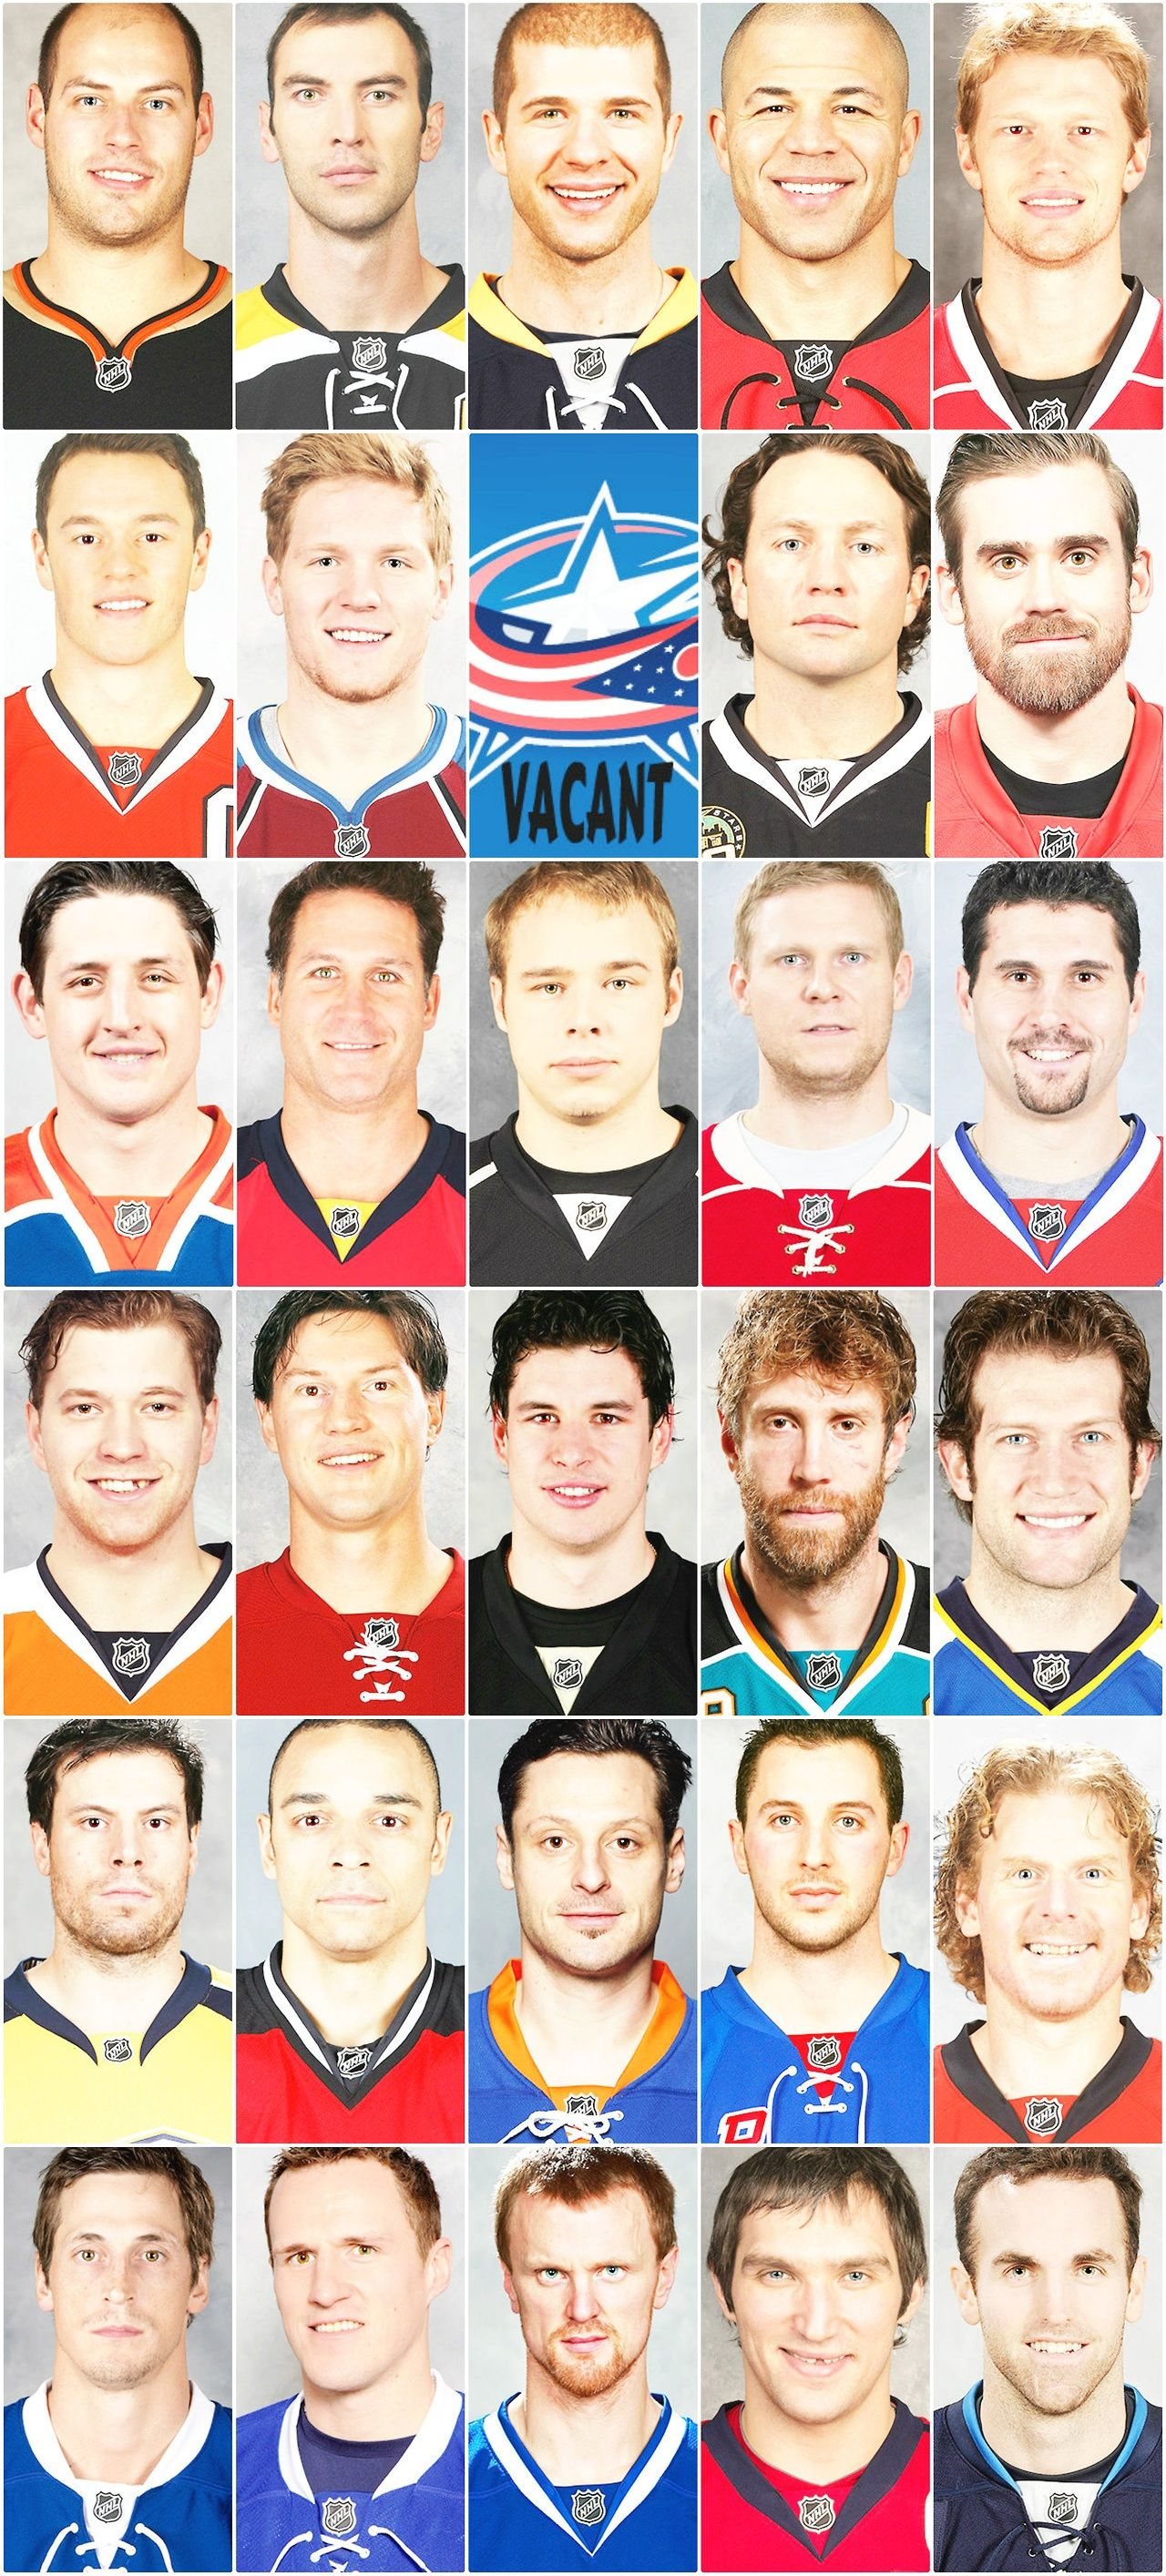 Your 2013 Nhl Team Captains In Alphabetical Order By City Hockey Hockey Season Hockey Players